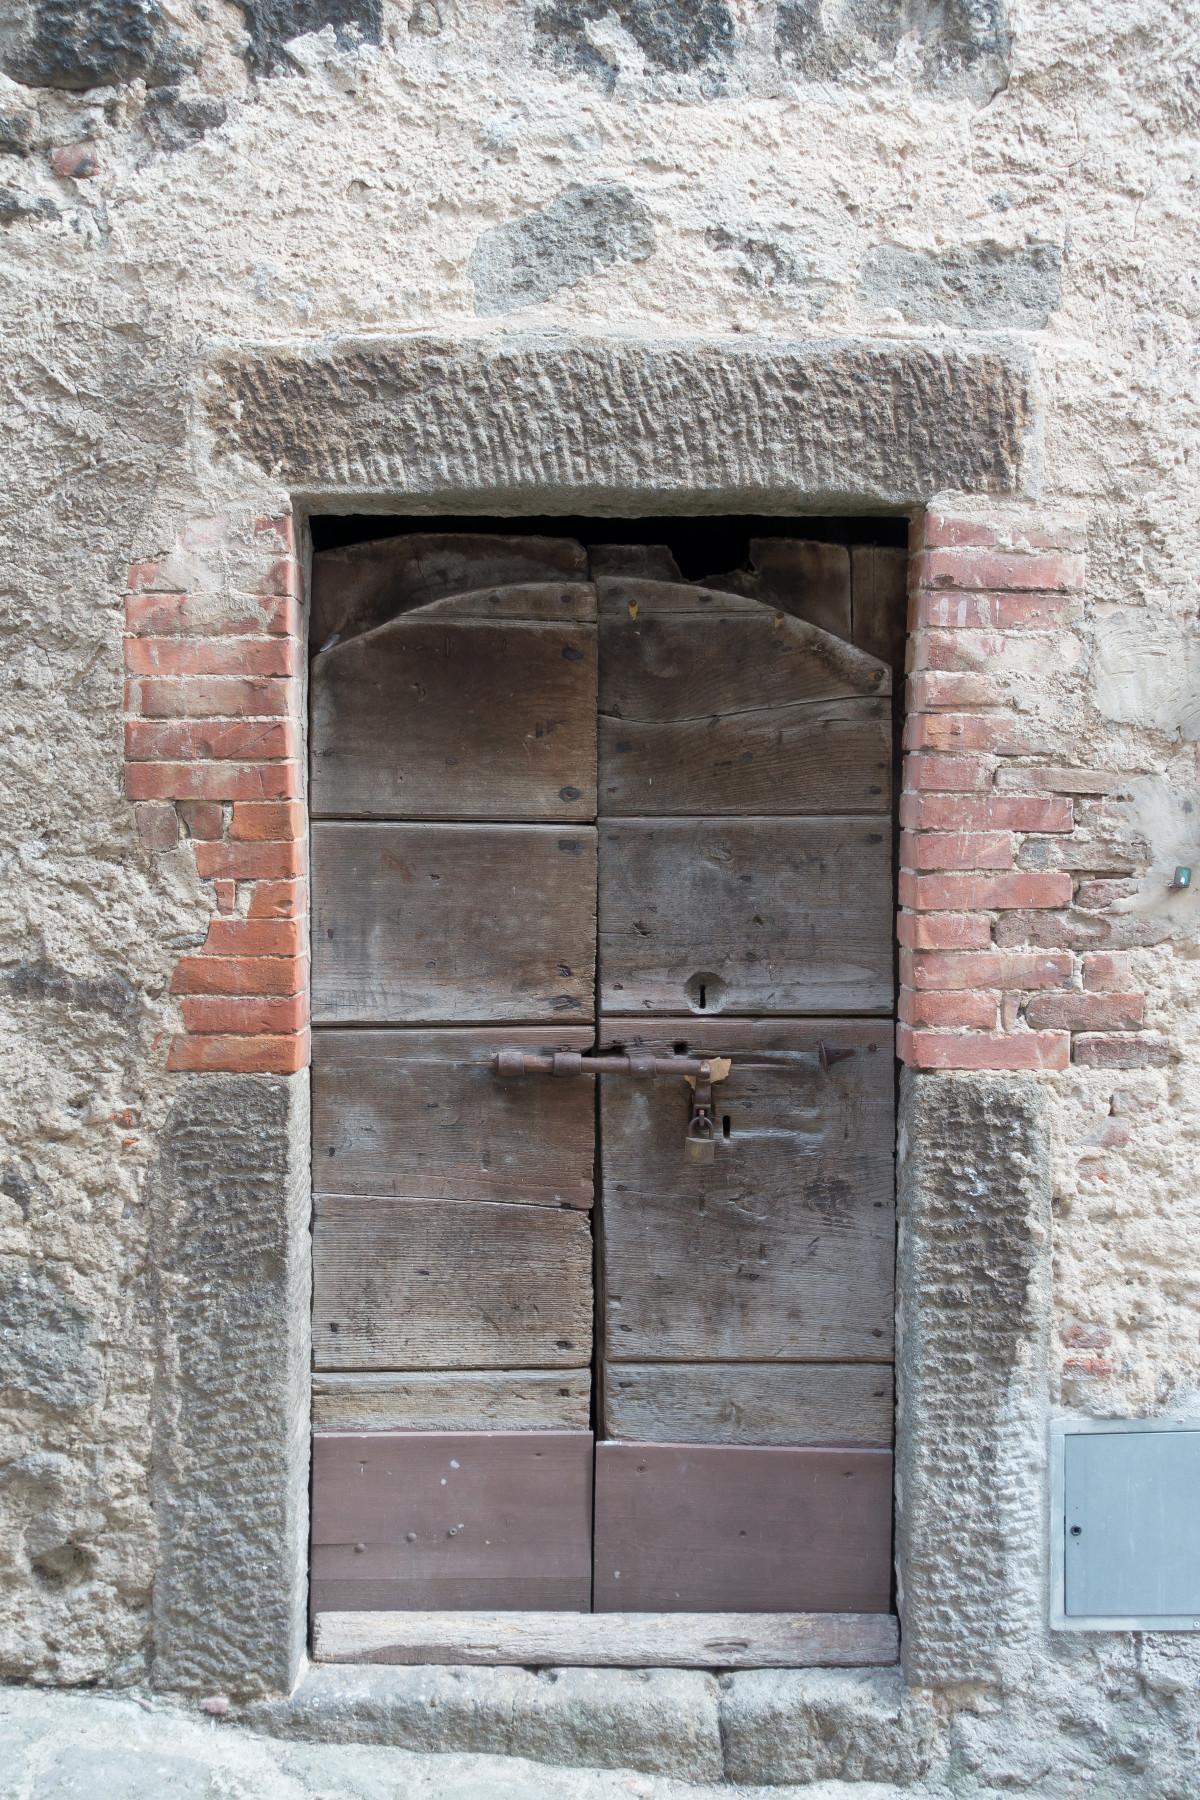 Fotos gratis arquitectura madera ventana edificio - Dintel de madera ...